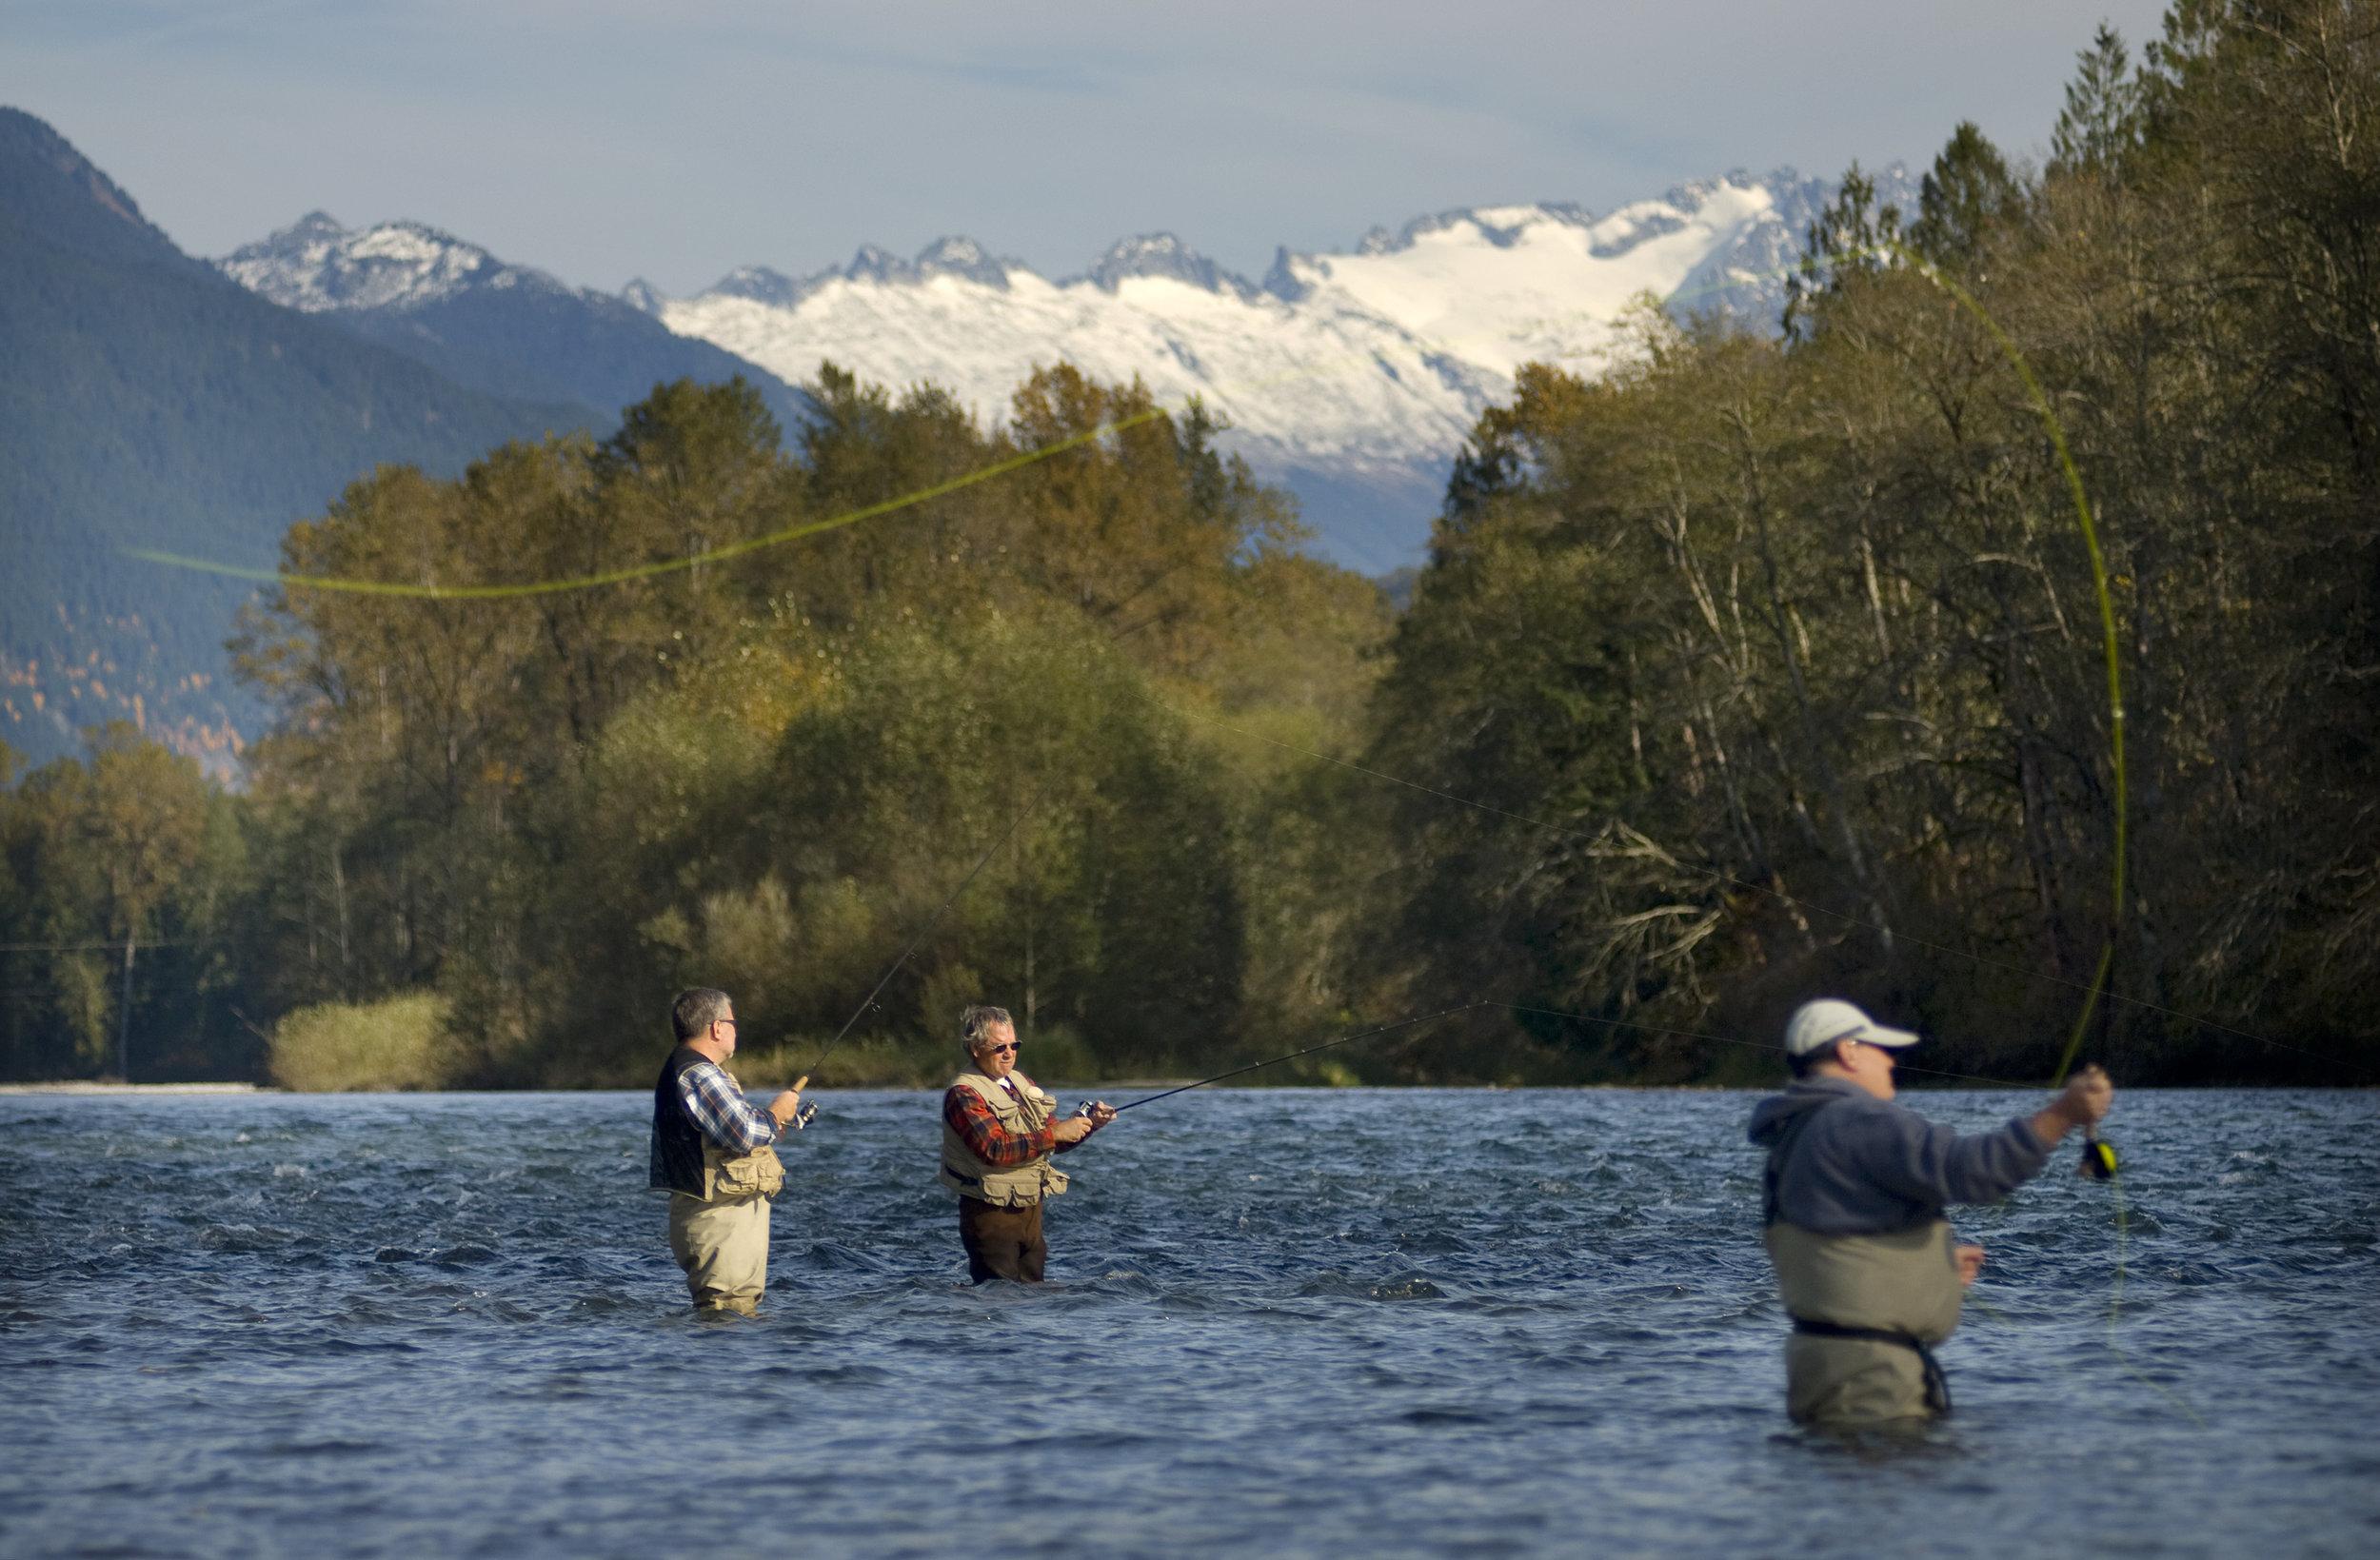 Fishing for salmon on the upper Skagit River near Mount Vernon, Washington. Photo ©Bridget Besaw